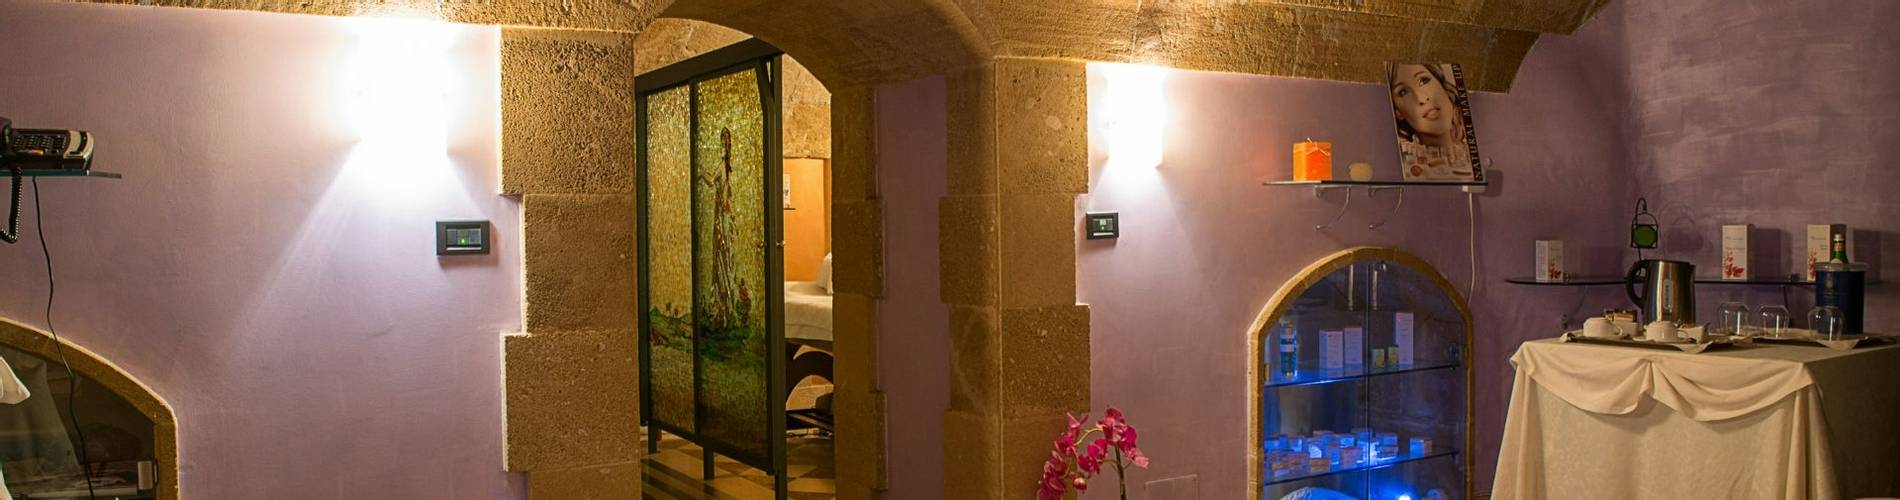 Grand Hotel Ortigia, Sicily, Italy (24).jpg